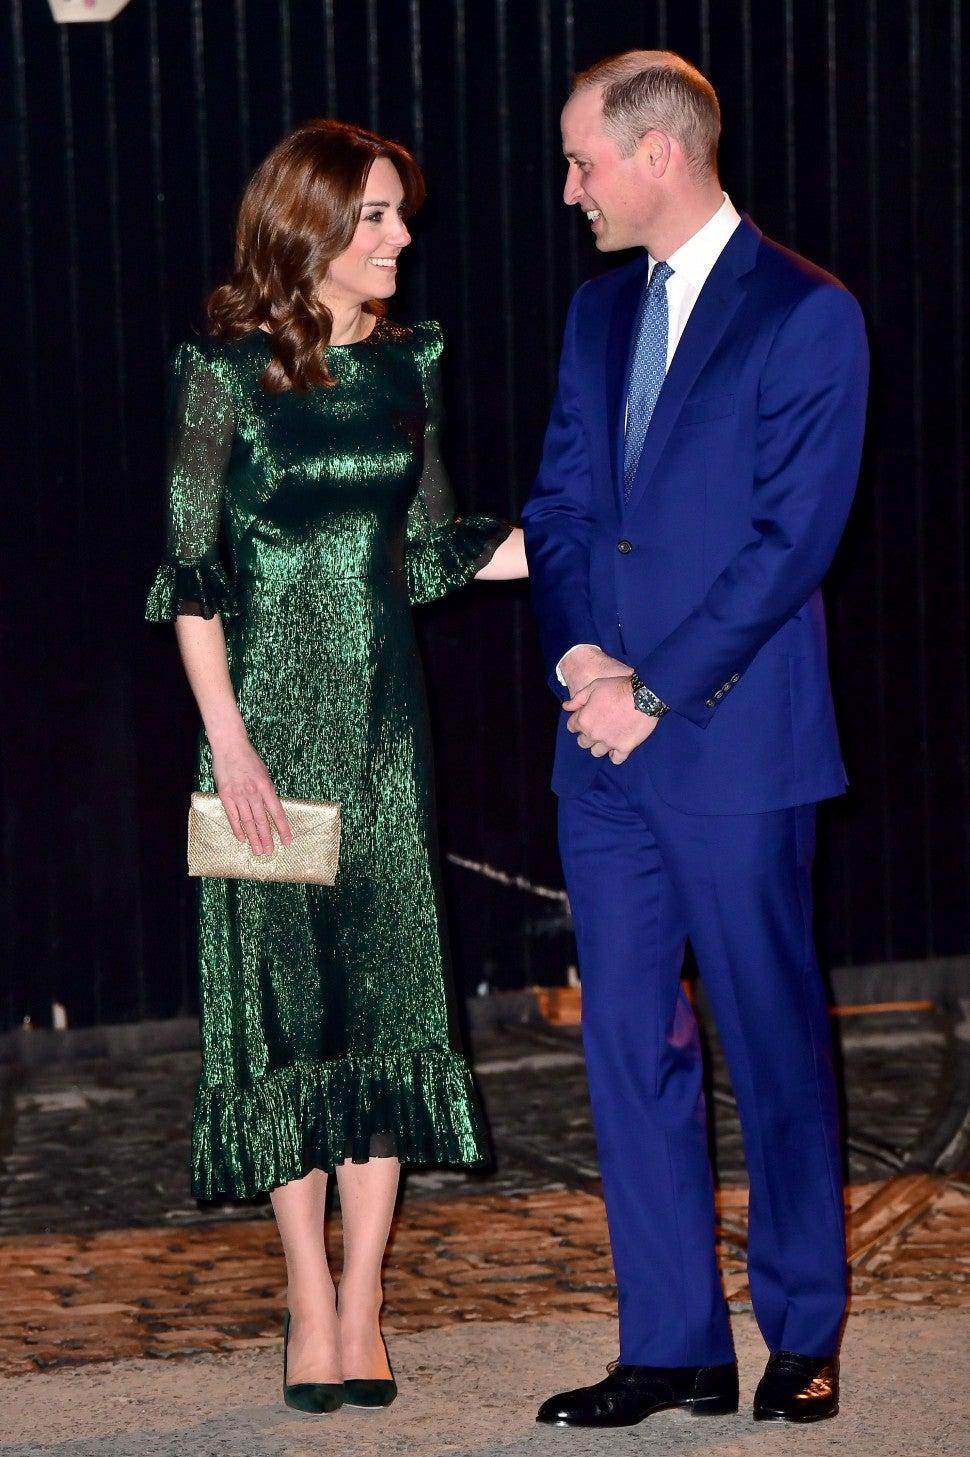 kKate Middleton Prince William